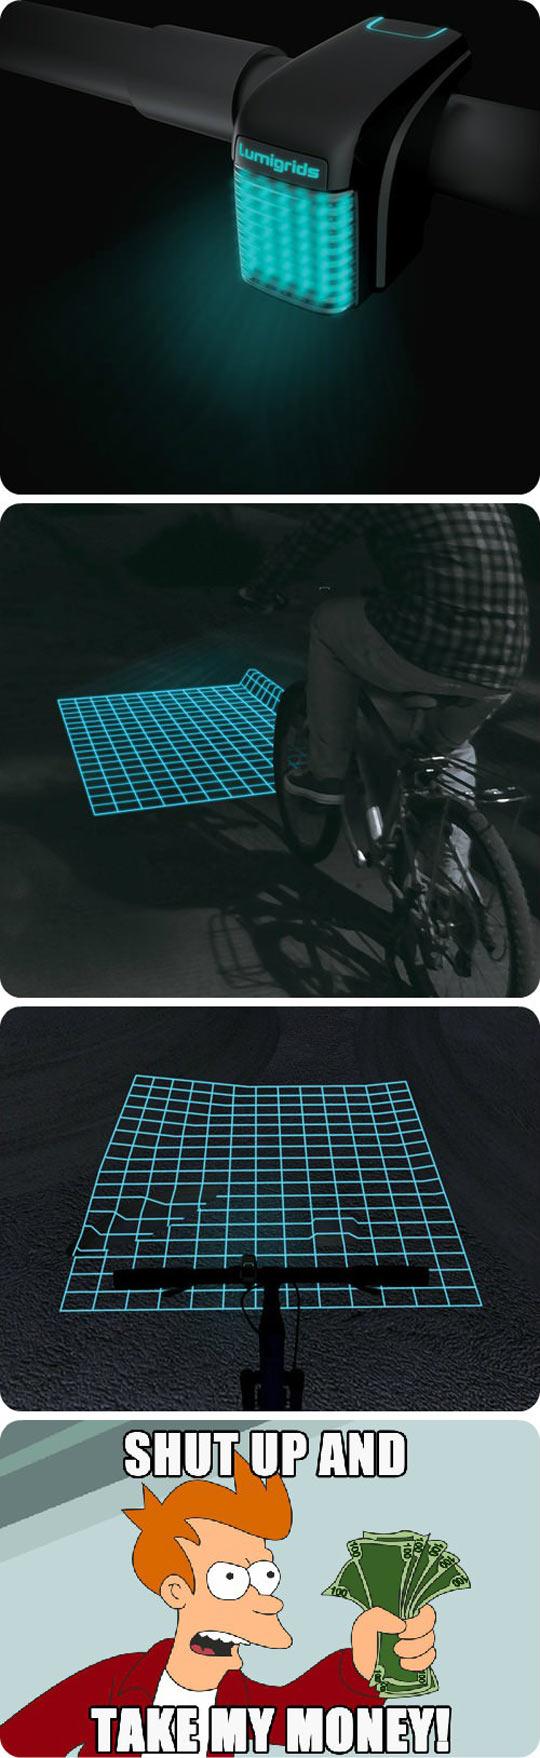 funny-bike-light-grid-night